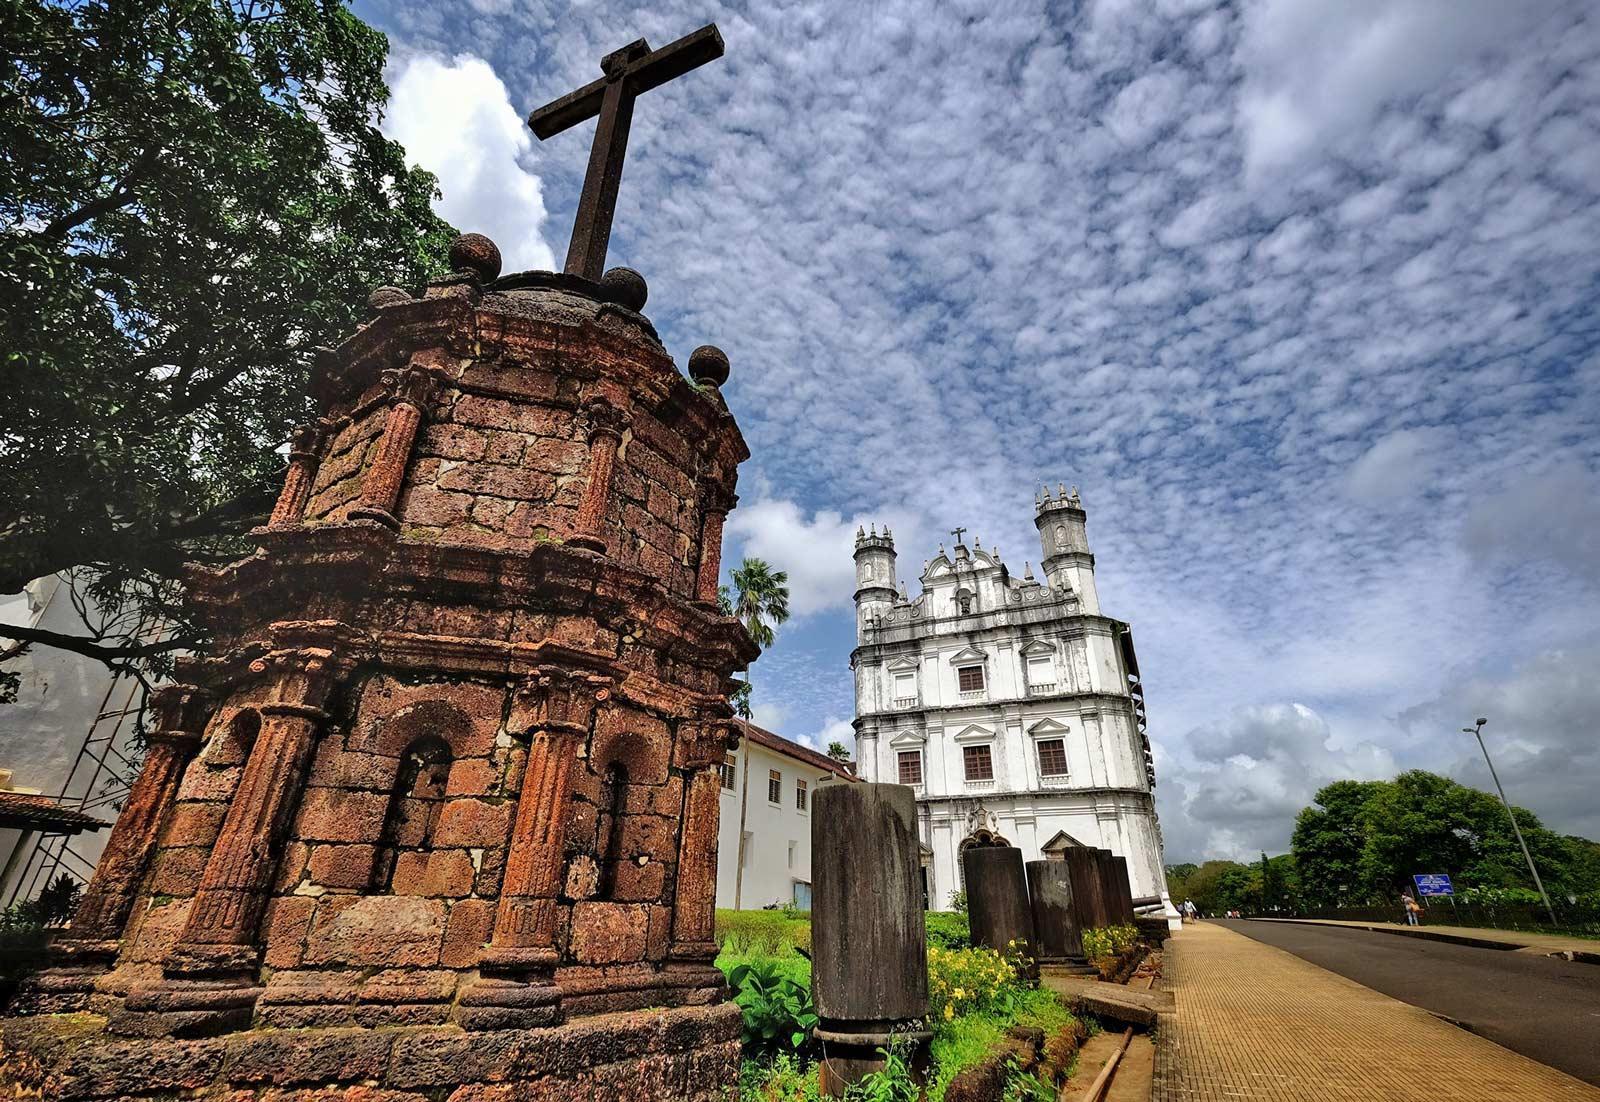 C:\Users\user\Desktop\Destination pictures\Goa\Old-Goa-Church-Goa India Iyaatra 6.jpg